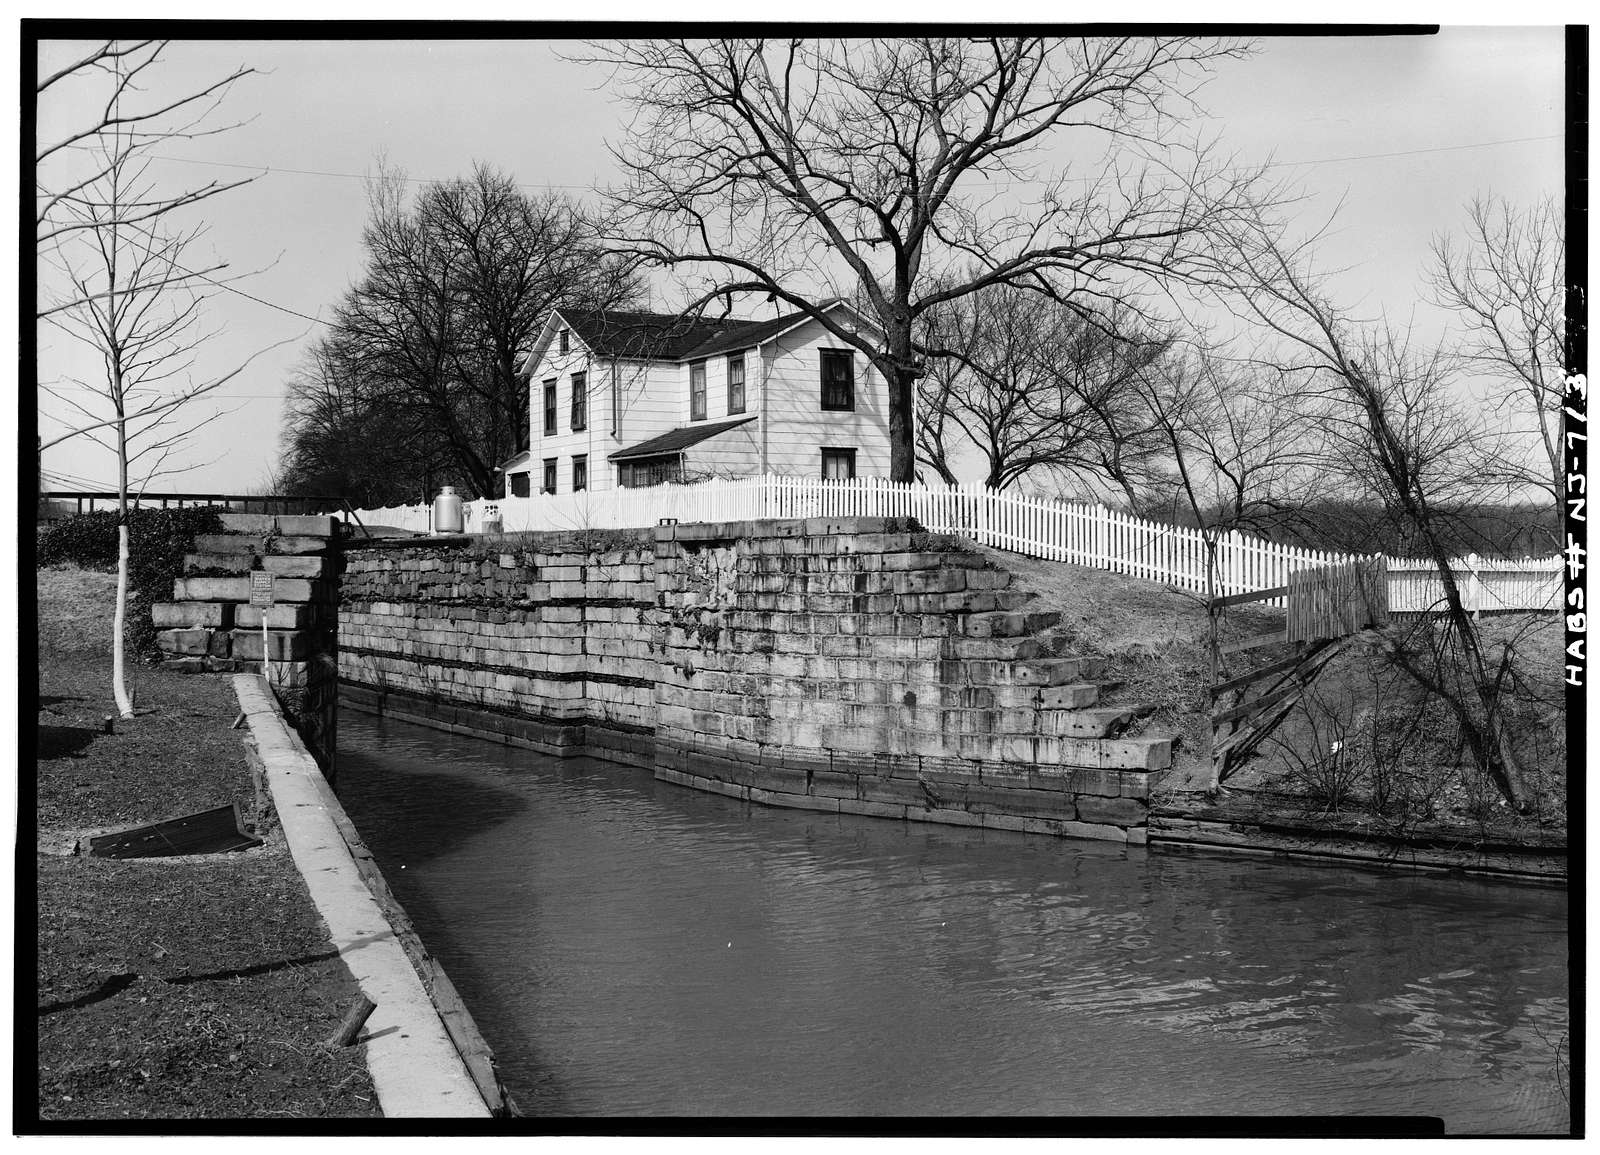 Delaware & Raritan Canal Lock, On Raritan River between George & Hamilton Streets, New Brunswick, Middlesex County, NJ